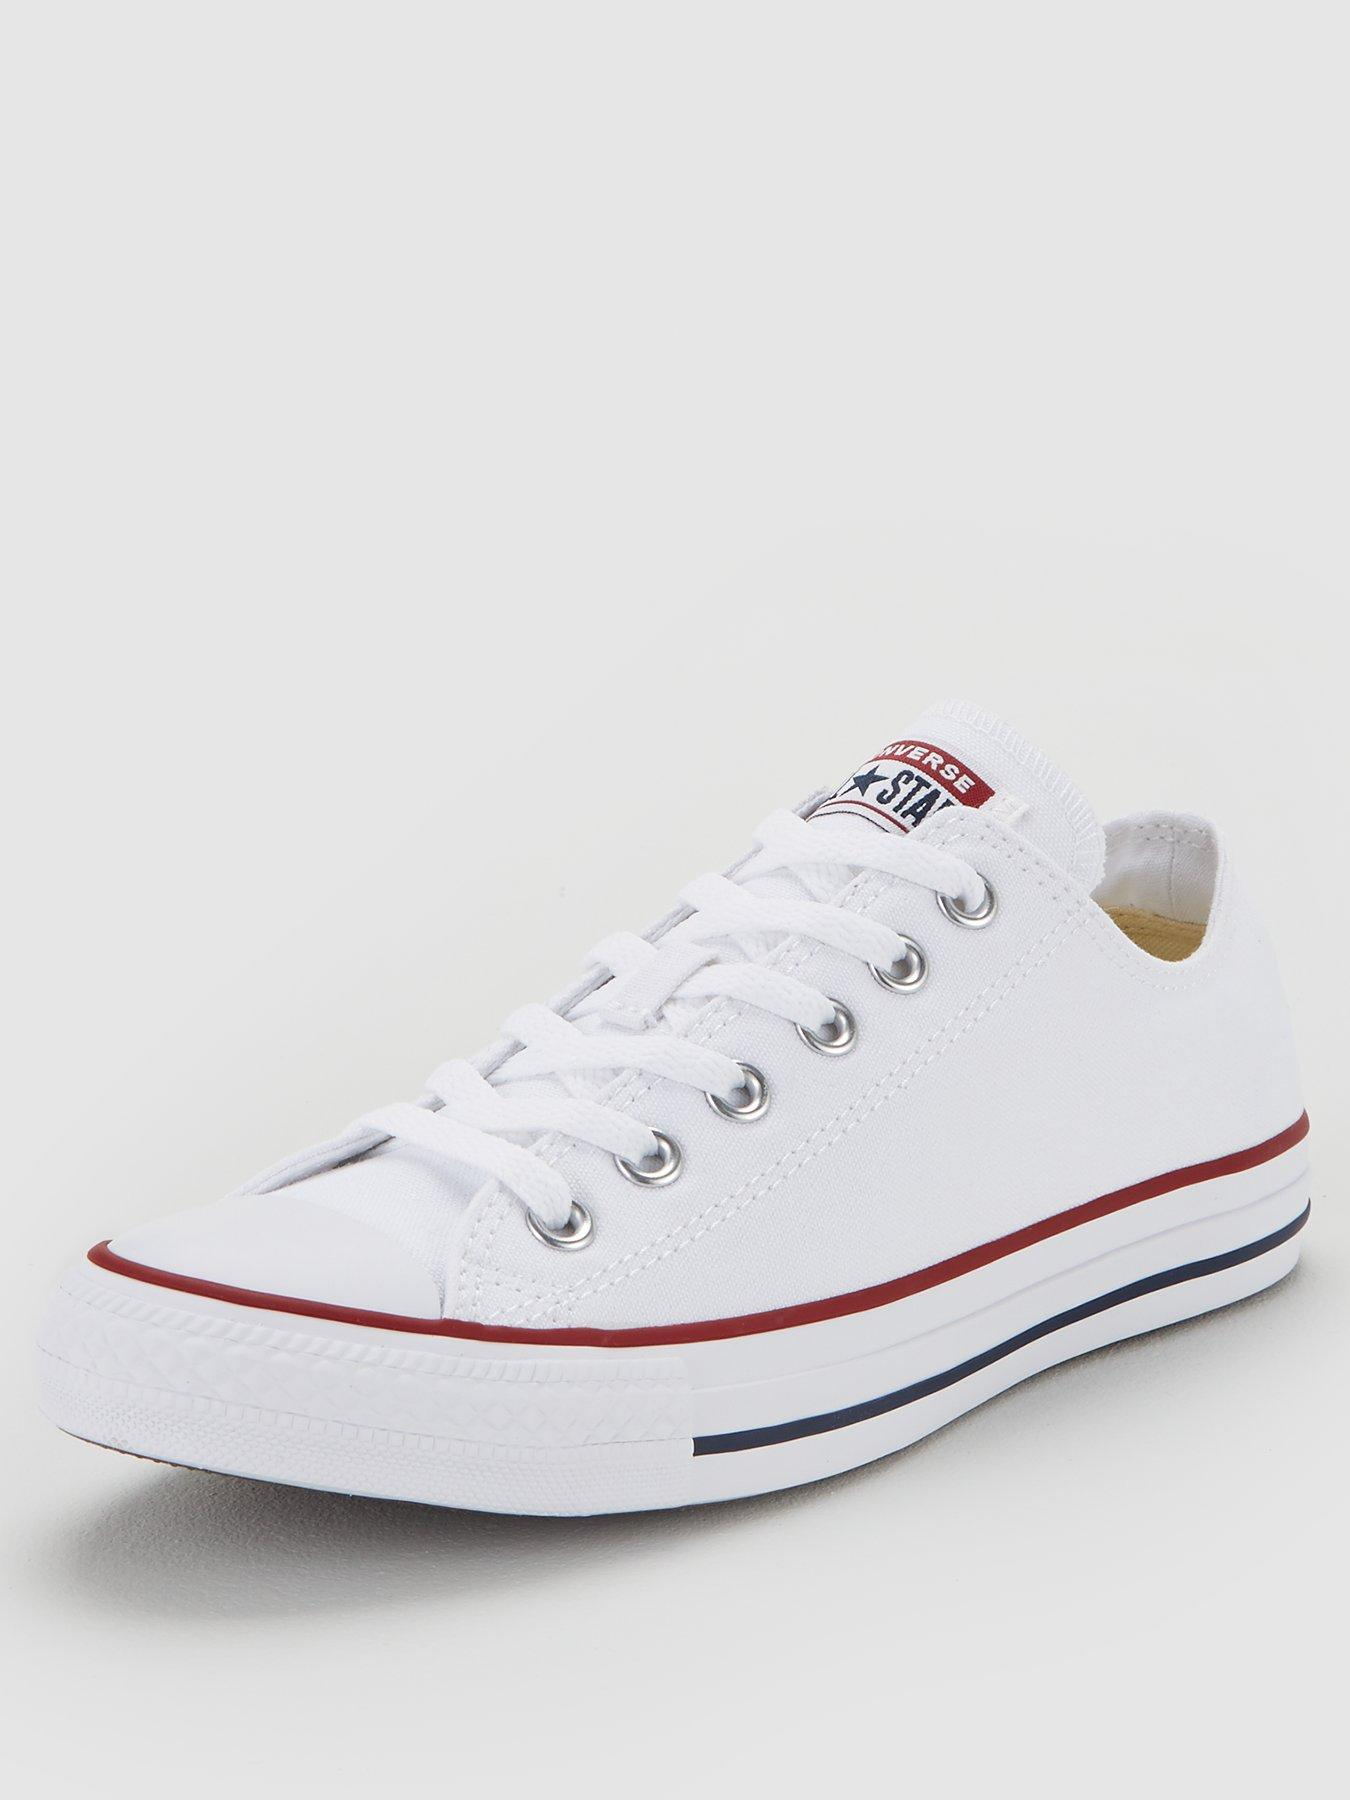 Modified Converse as a subtle nod to Ten :) | Clothing